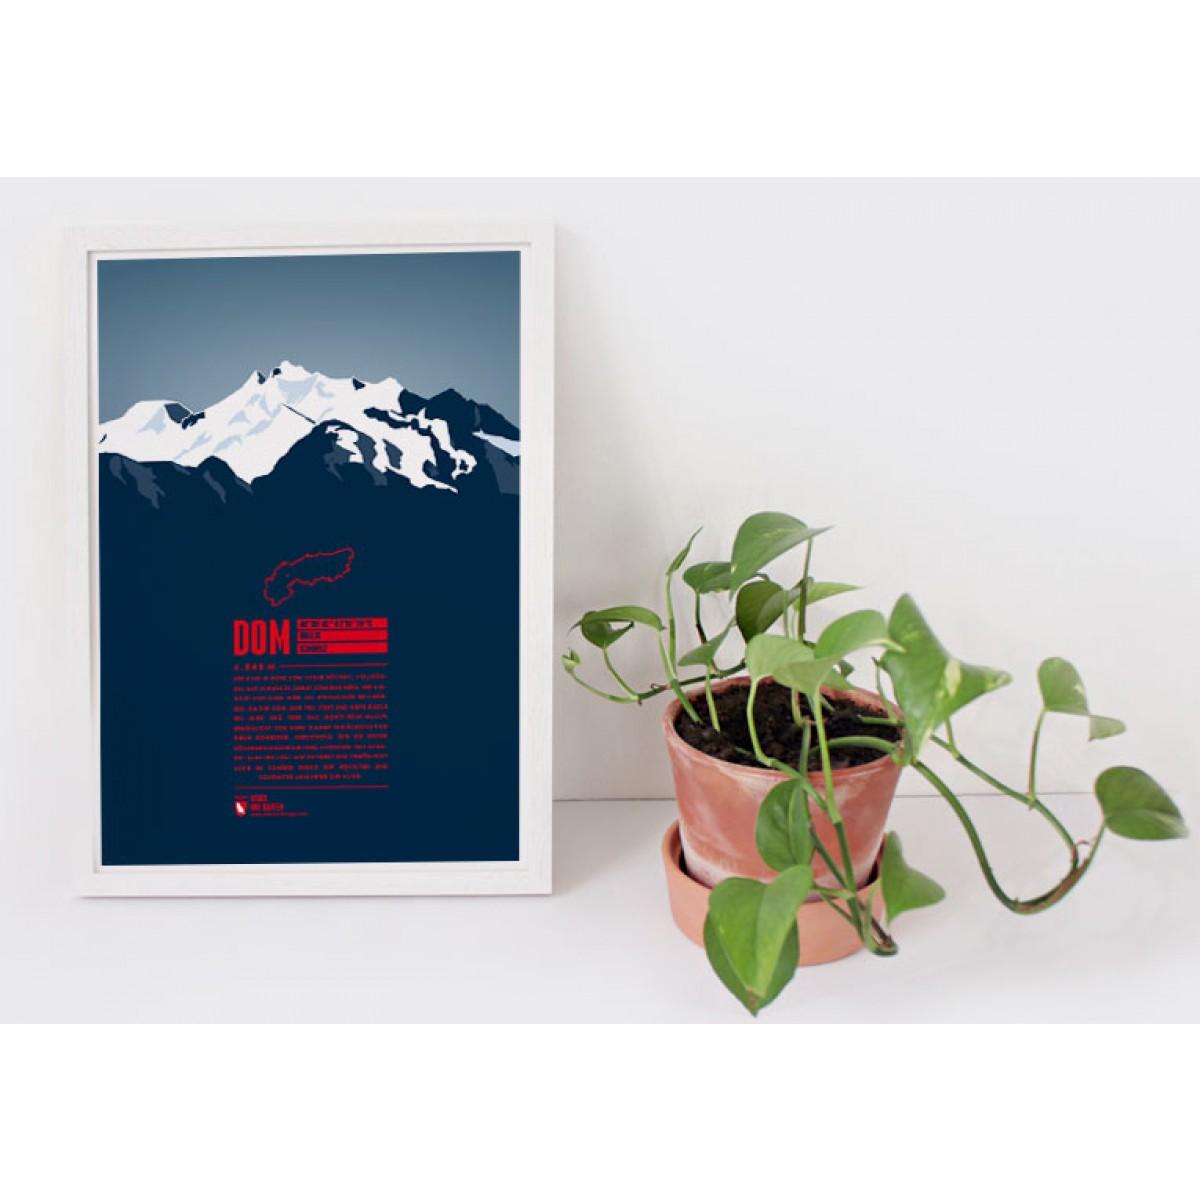 Dom - Bergdruck